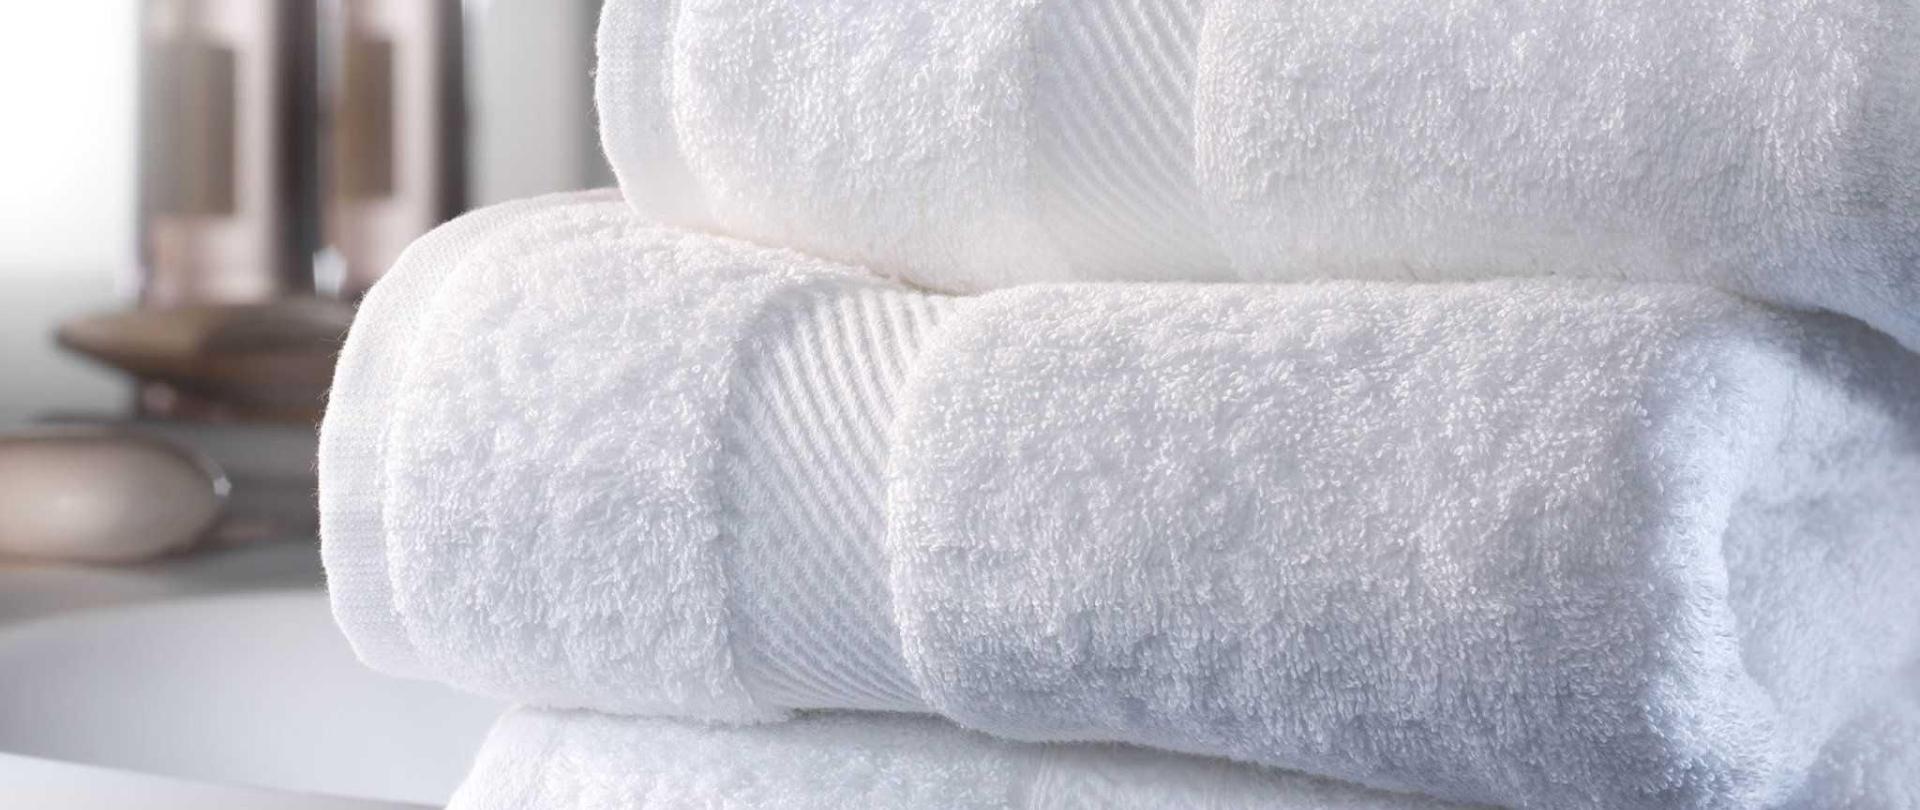 asciugamani-bianchi.jpg